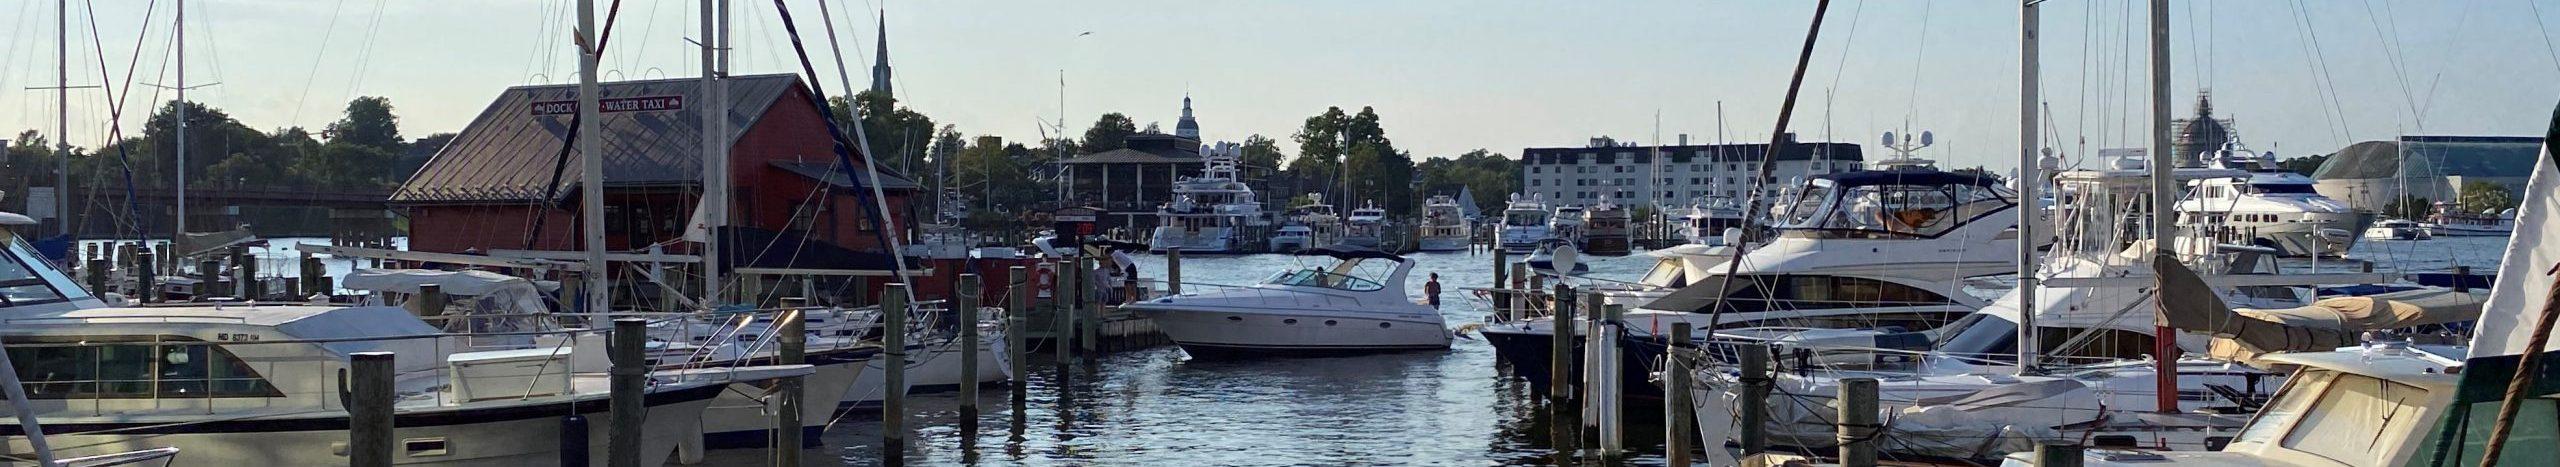 Scene of Annapolis Harnbor